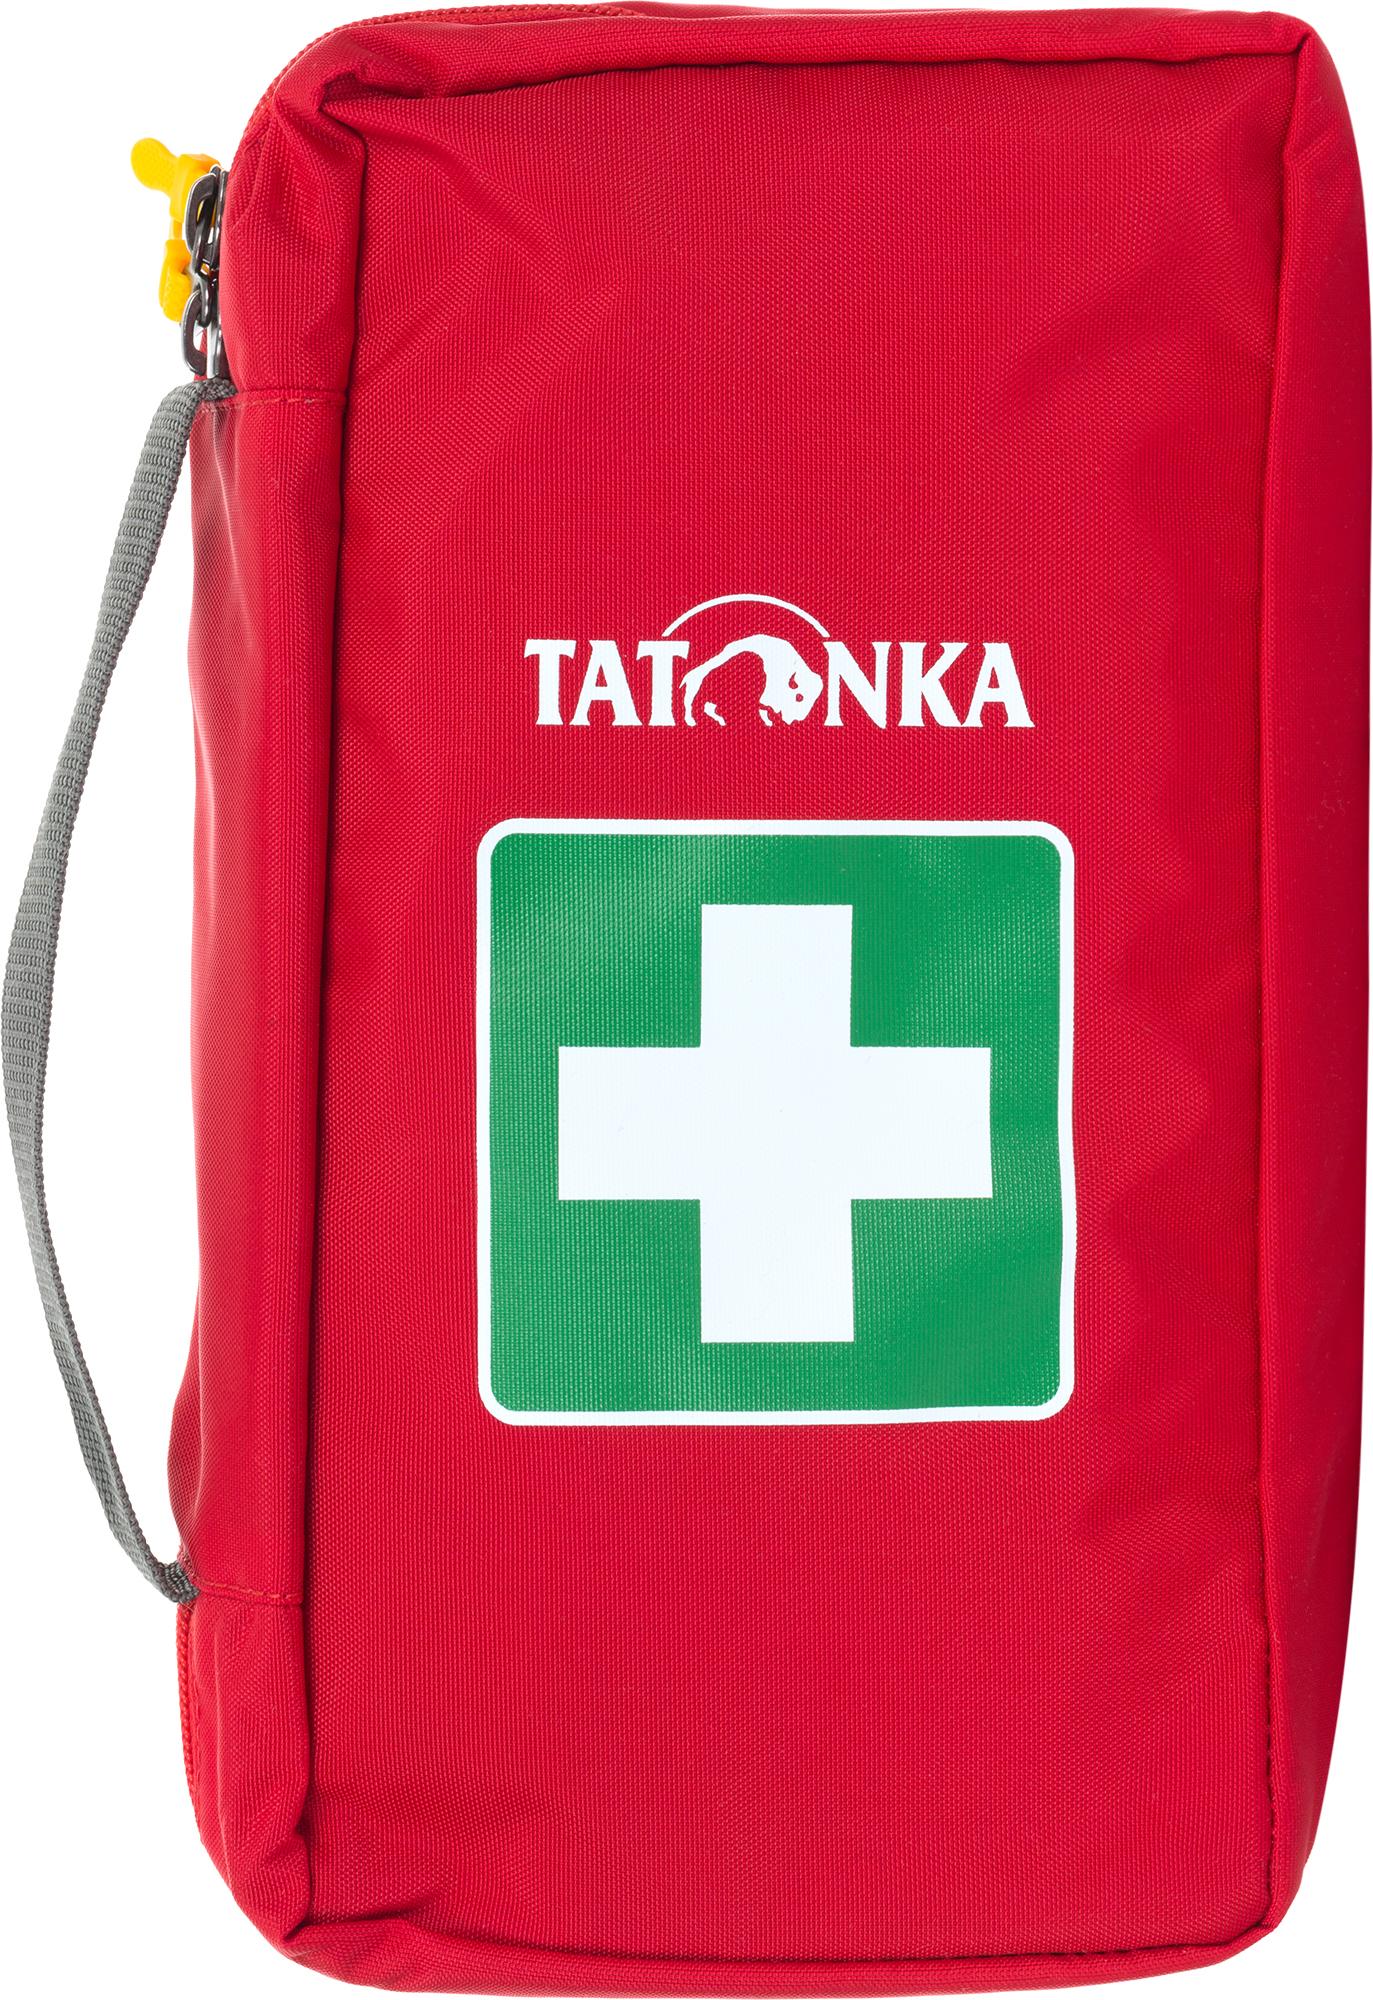 Tatonka Аптечка Tatonka First Aid M